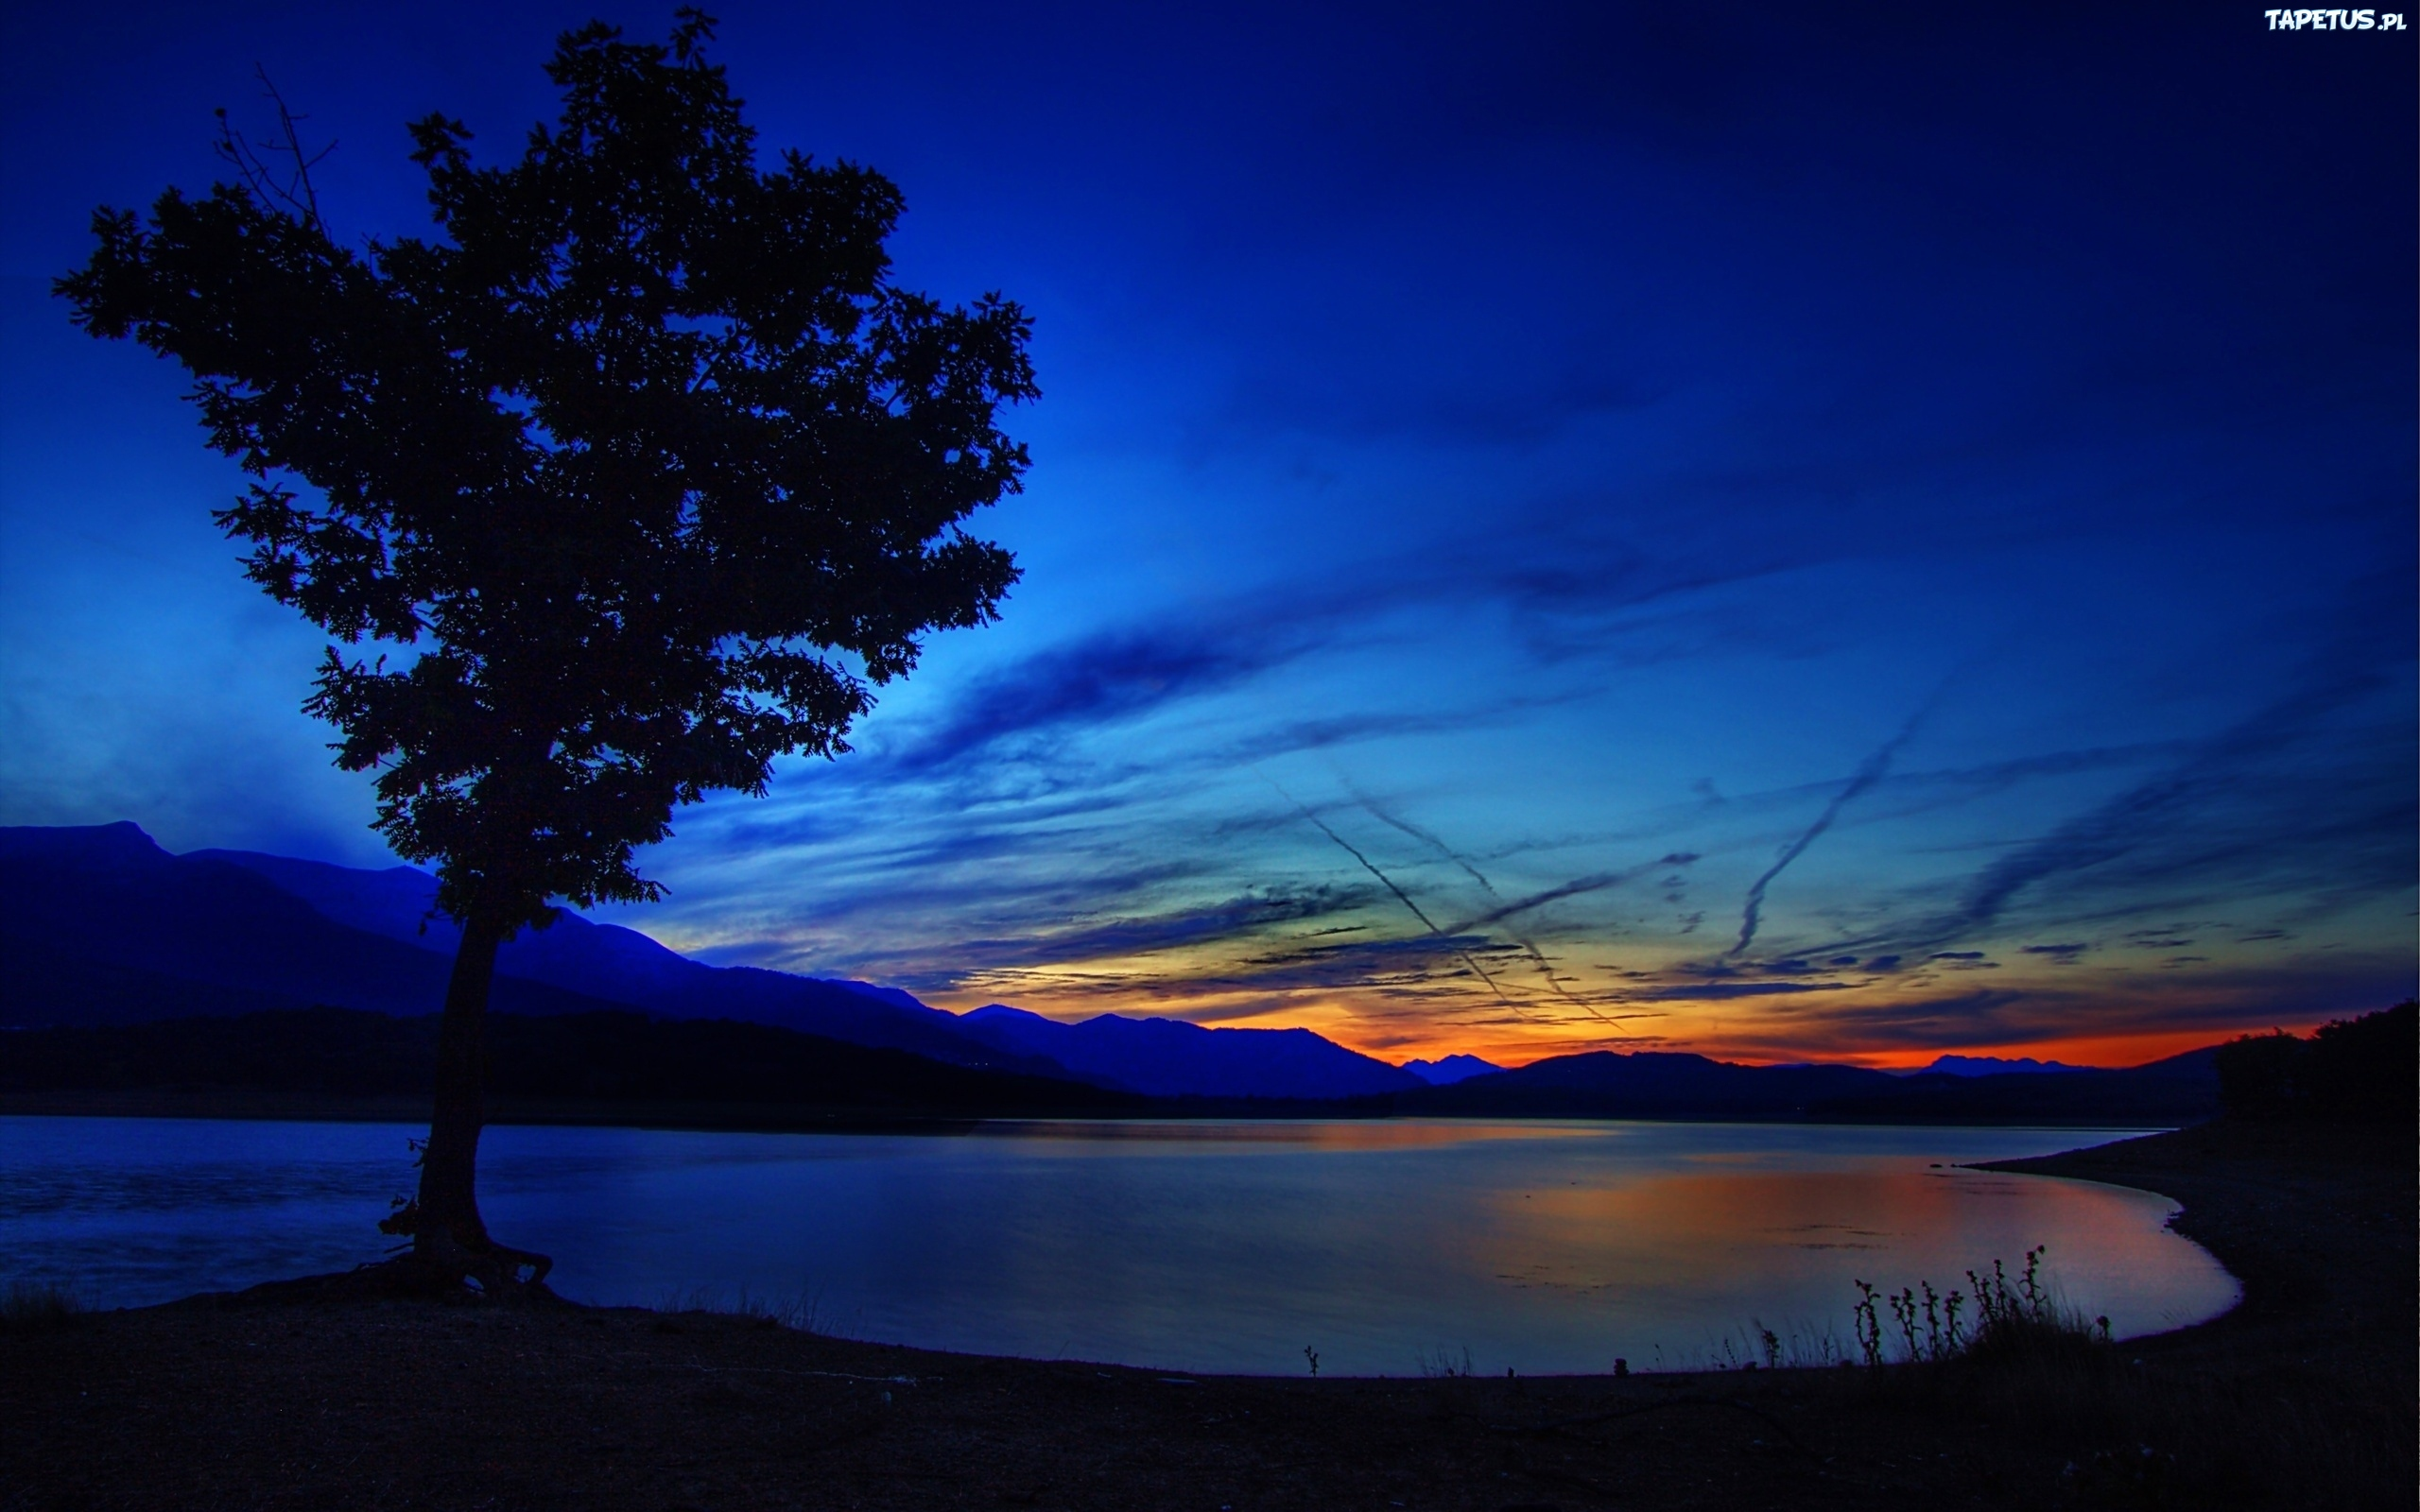 природа озеро деревья небо облака закат  № 1249594 без смс